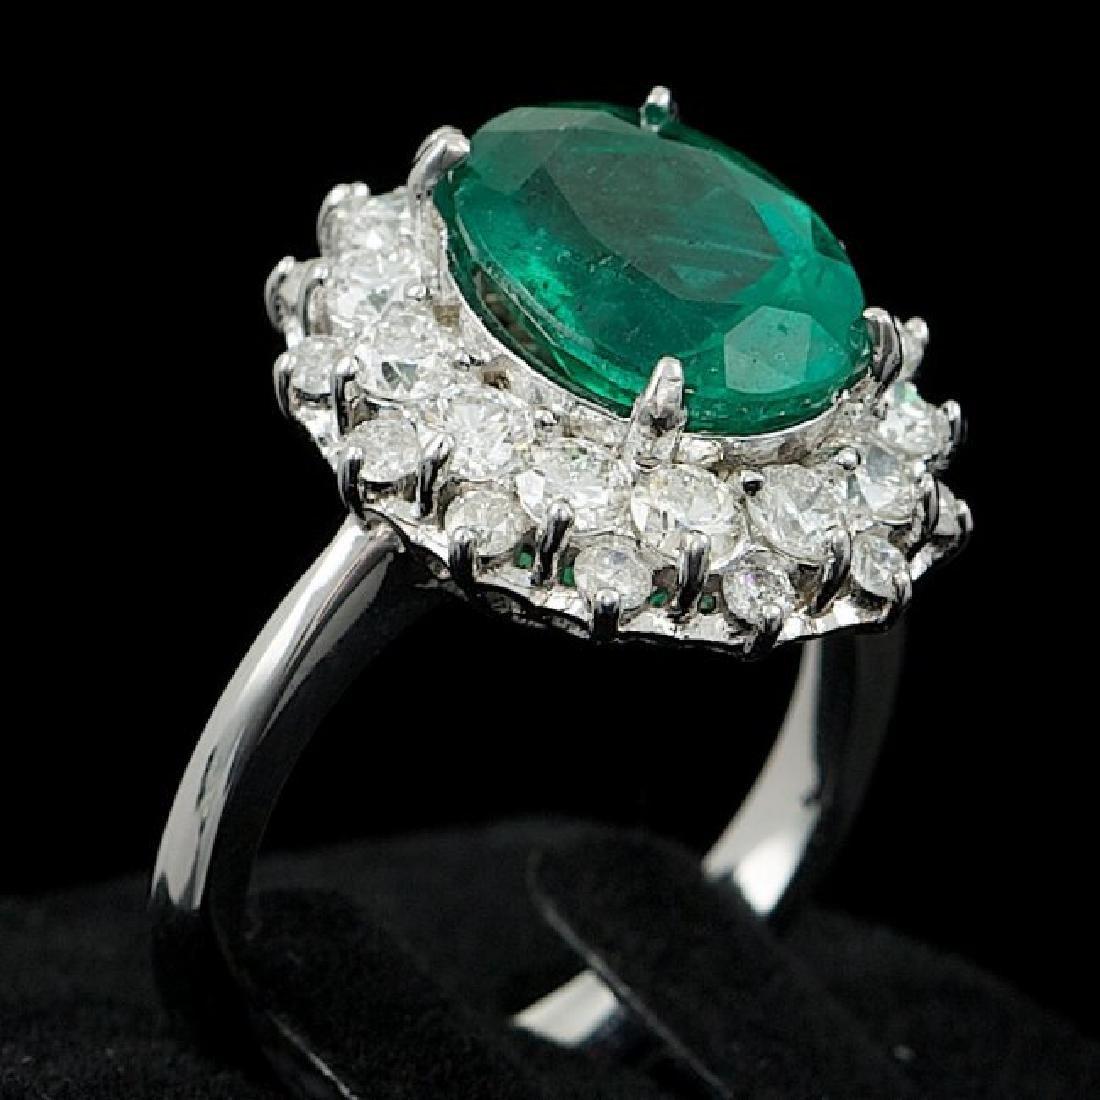 14k White Gold 3.50ct Emerald 1.55ct Diamond Ring - 3